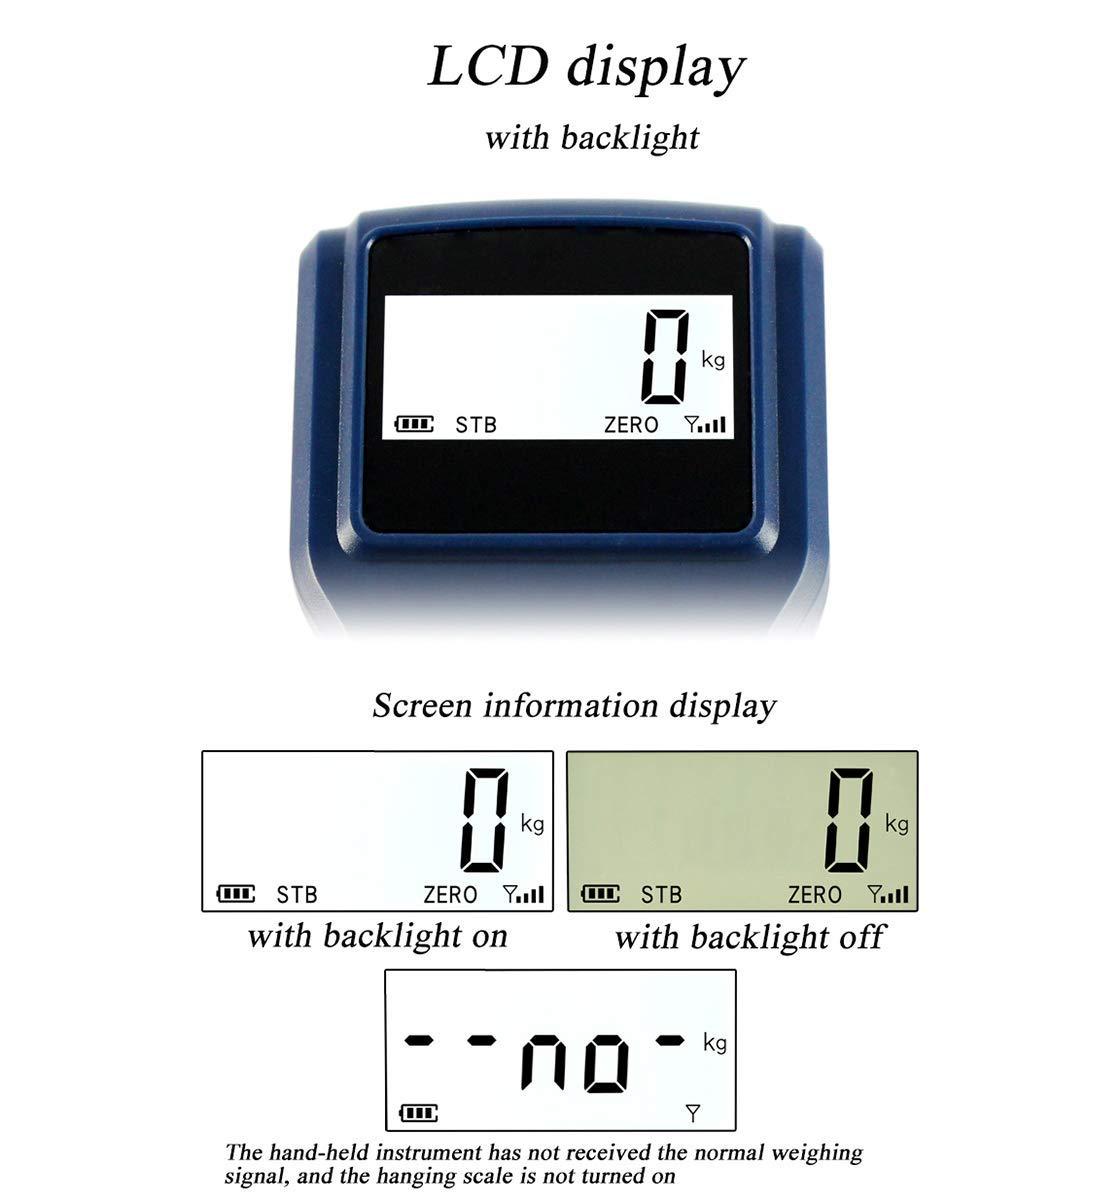 NEWTRY Elektronische Kranwaage 10T//10000KG Industriewaage Kabellos Digitale H/ängewaage LED Bildschirm mit Fernbedienung